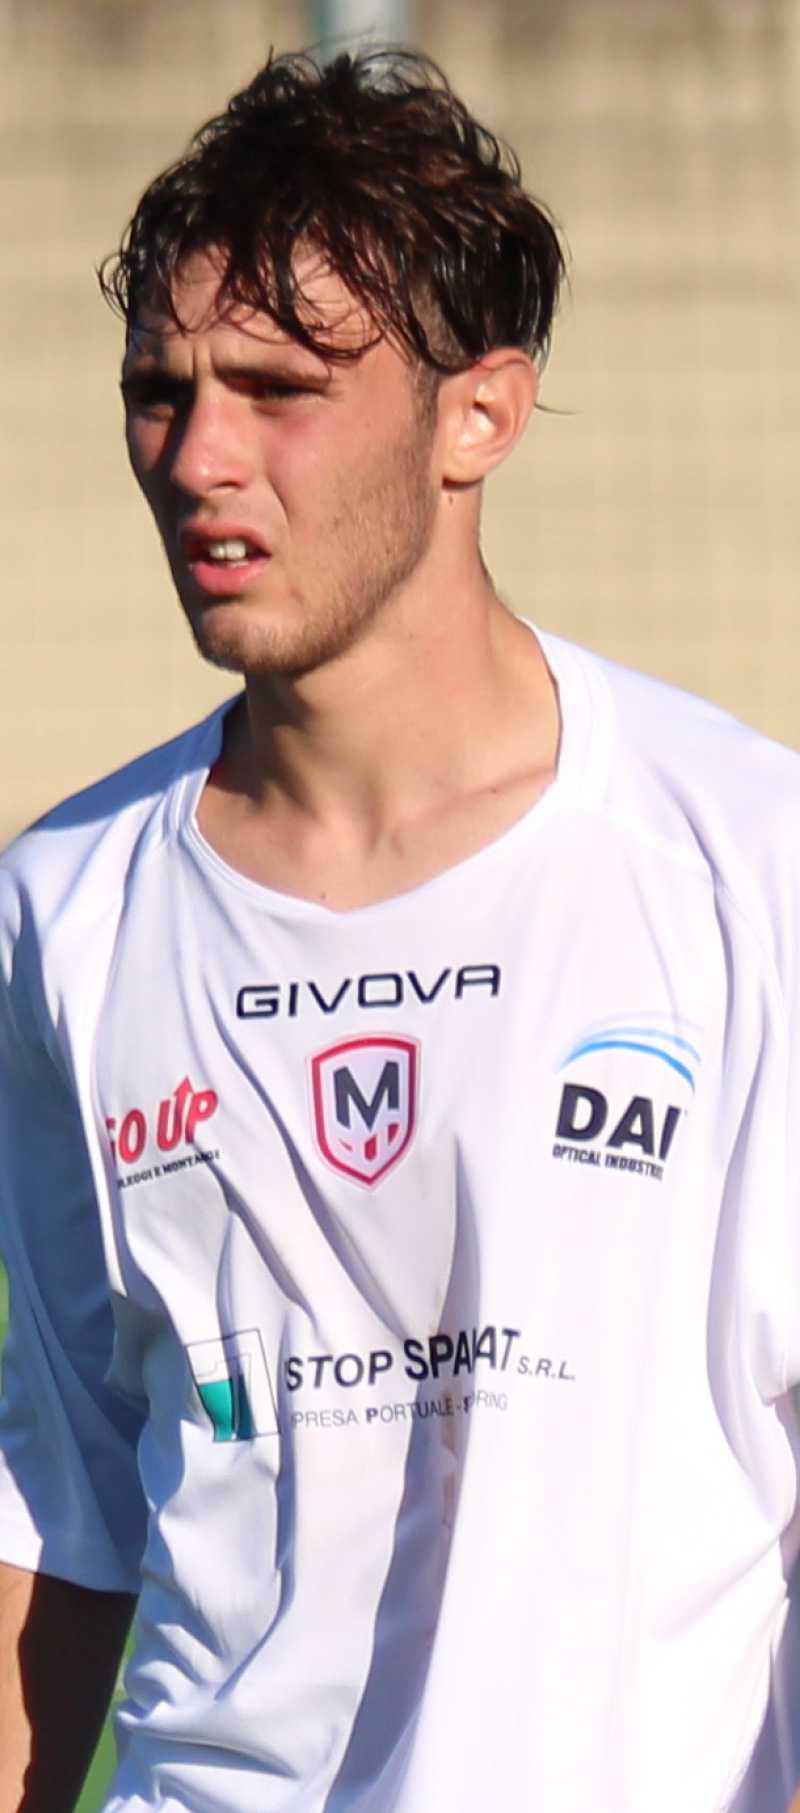 DAVIDE MAROLLA